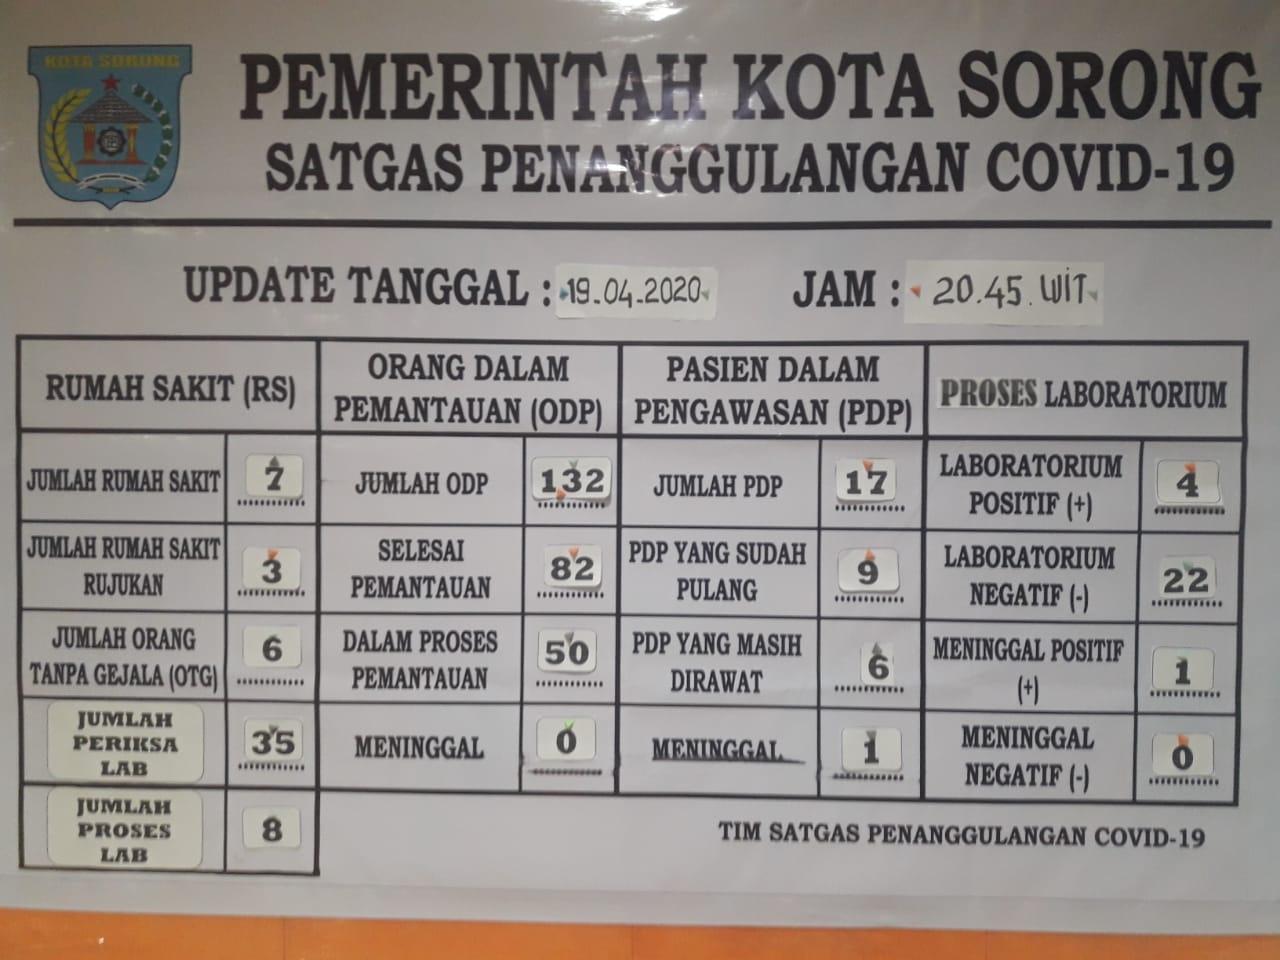 Warga Patut Waspada, Kota Sorong Jadi Transmisi Lokal Covid-19 15 IMG 20200420 WA0005 1